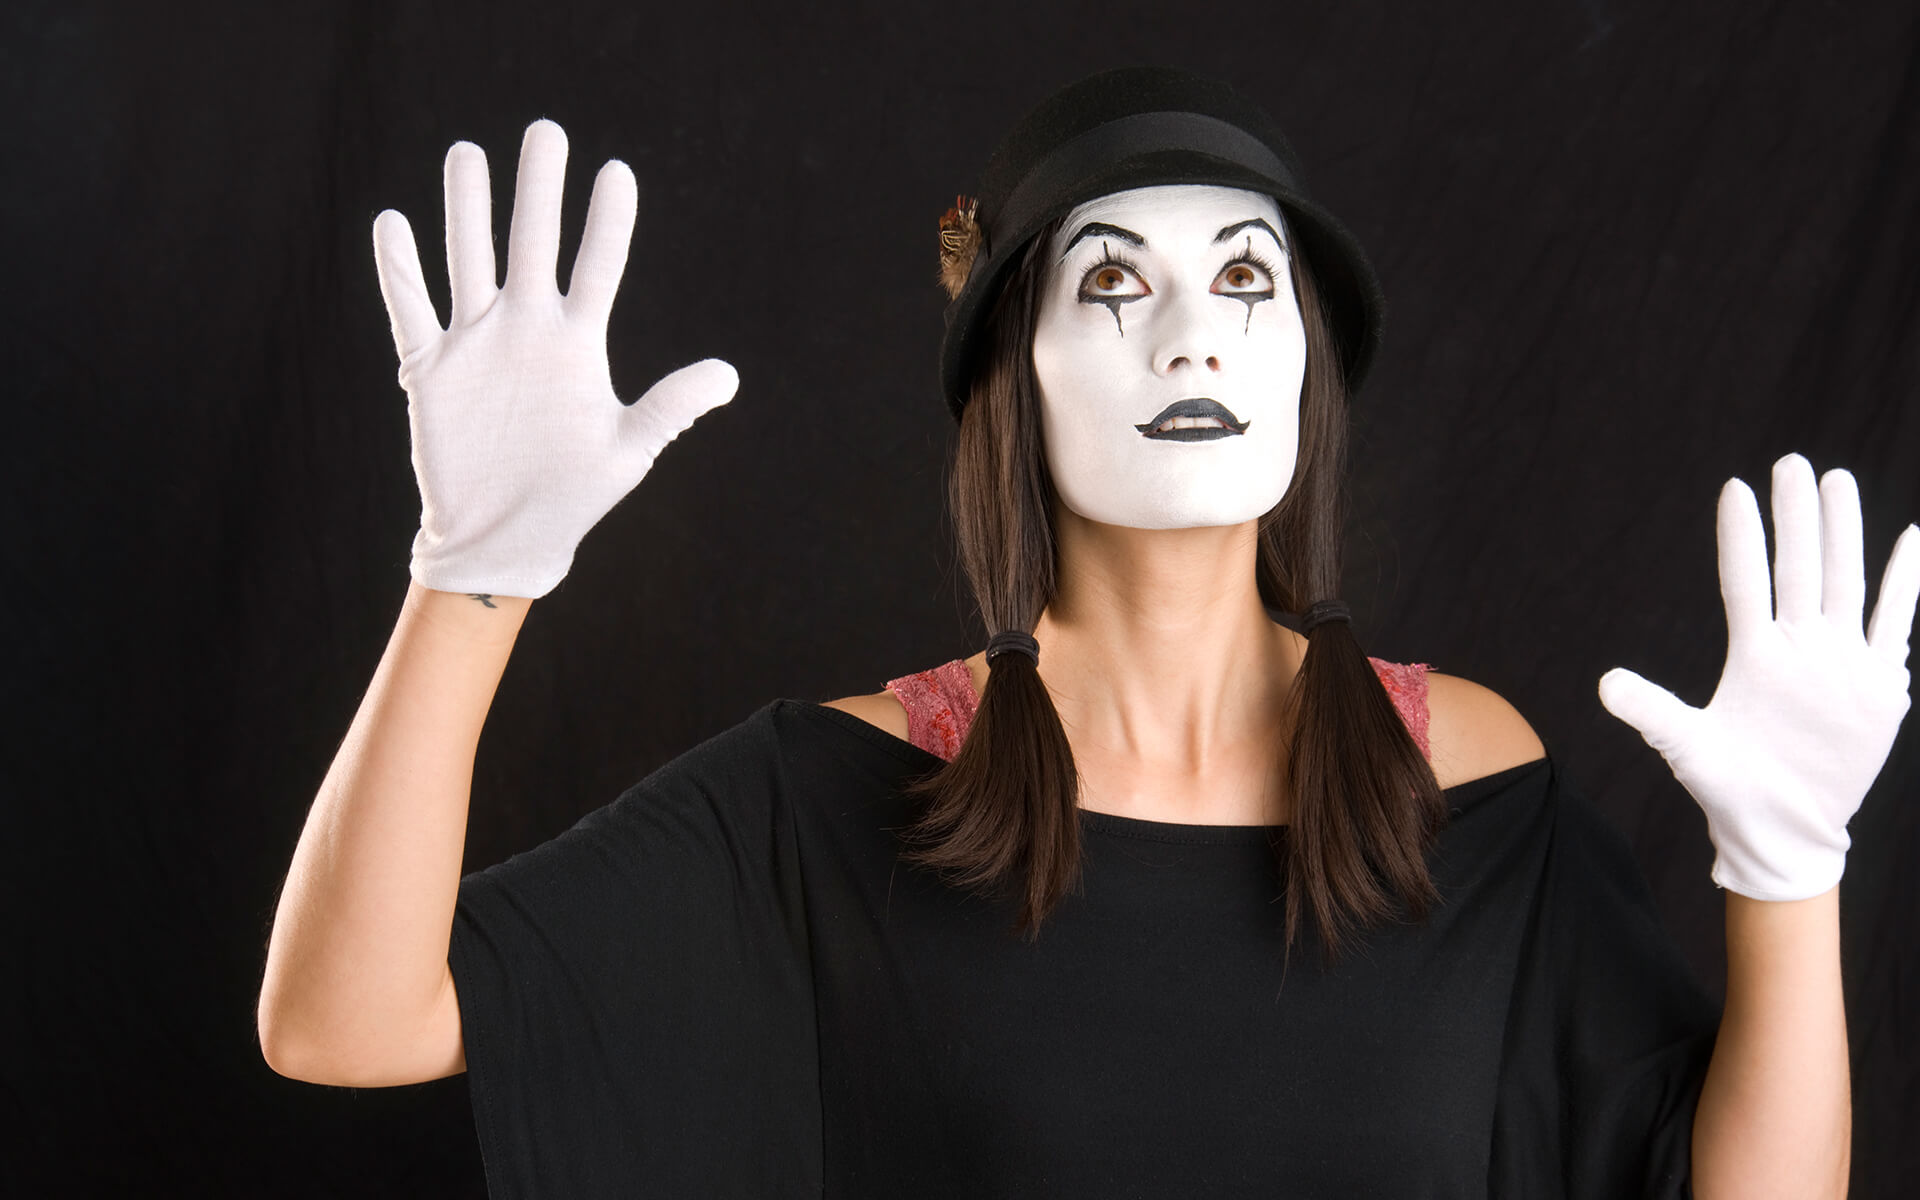 A mime girl